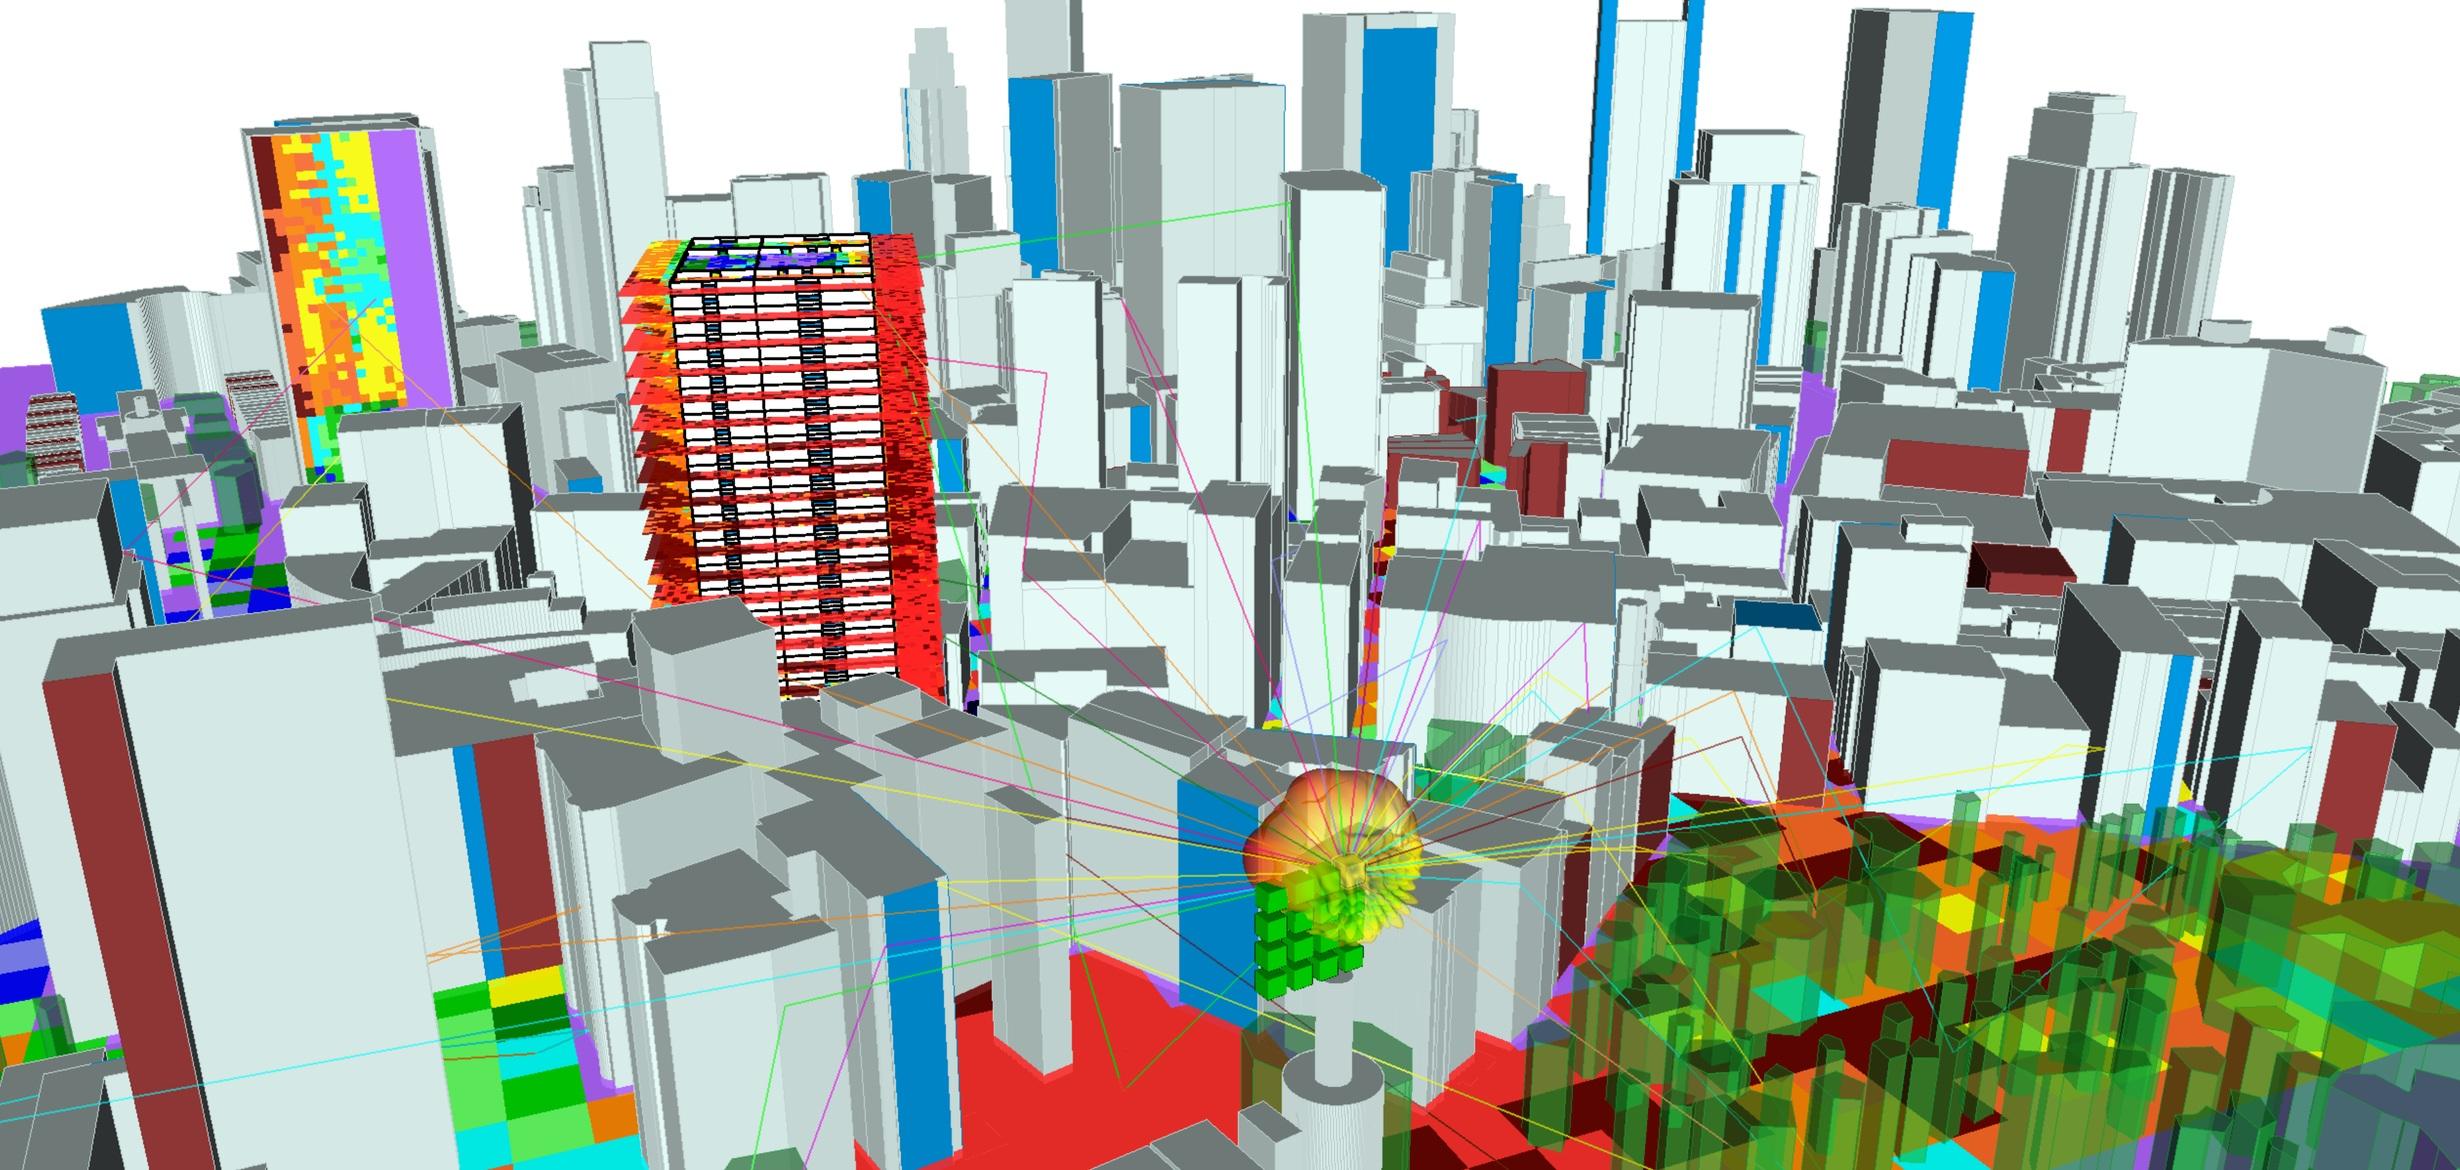 Final+in+with+3+buildings+in+back.jpg